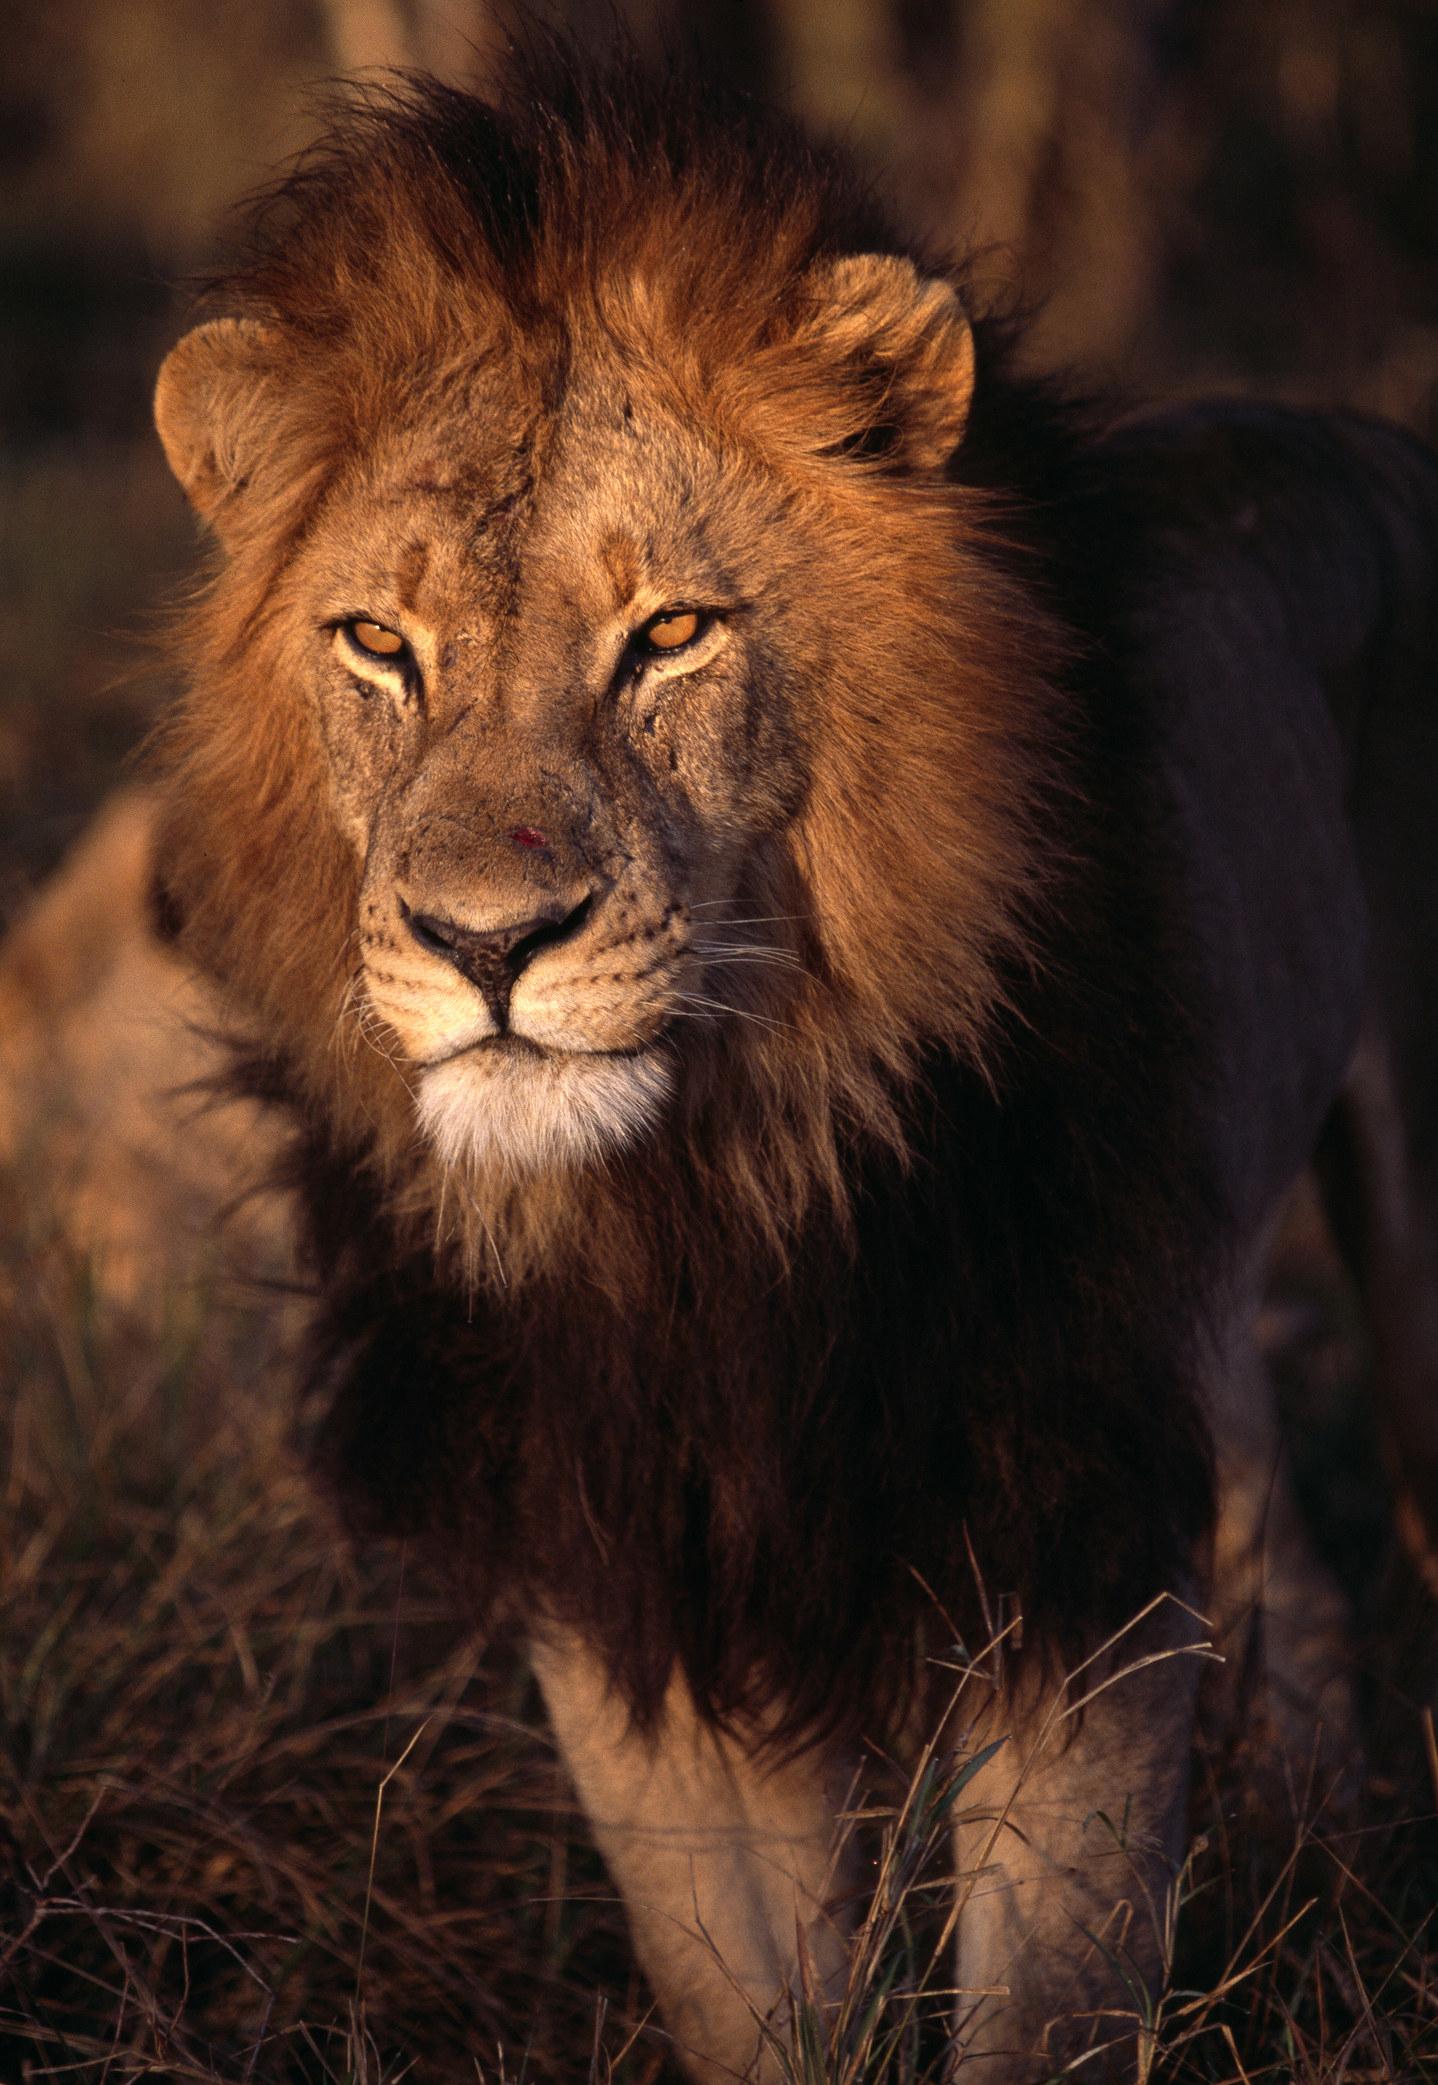 Www Lion Com - About Horse and Lion Photos